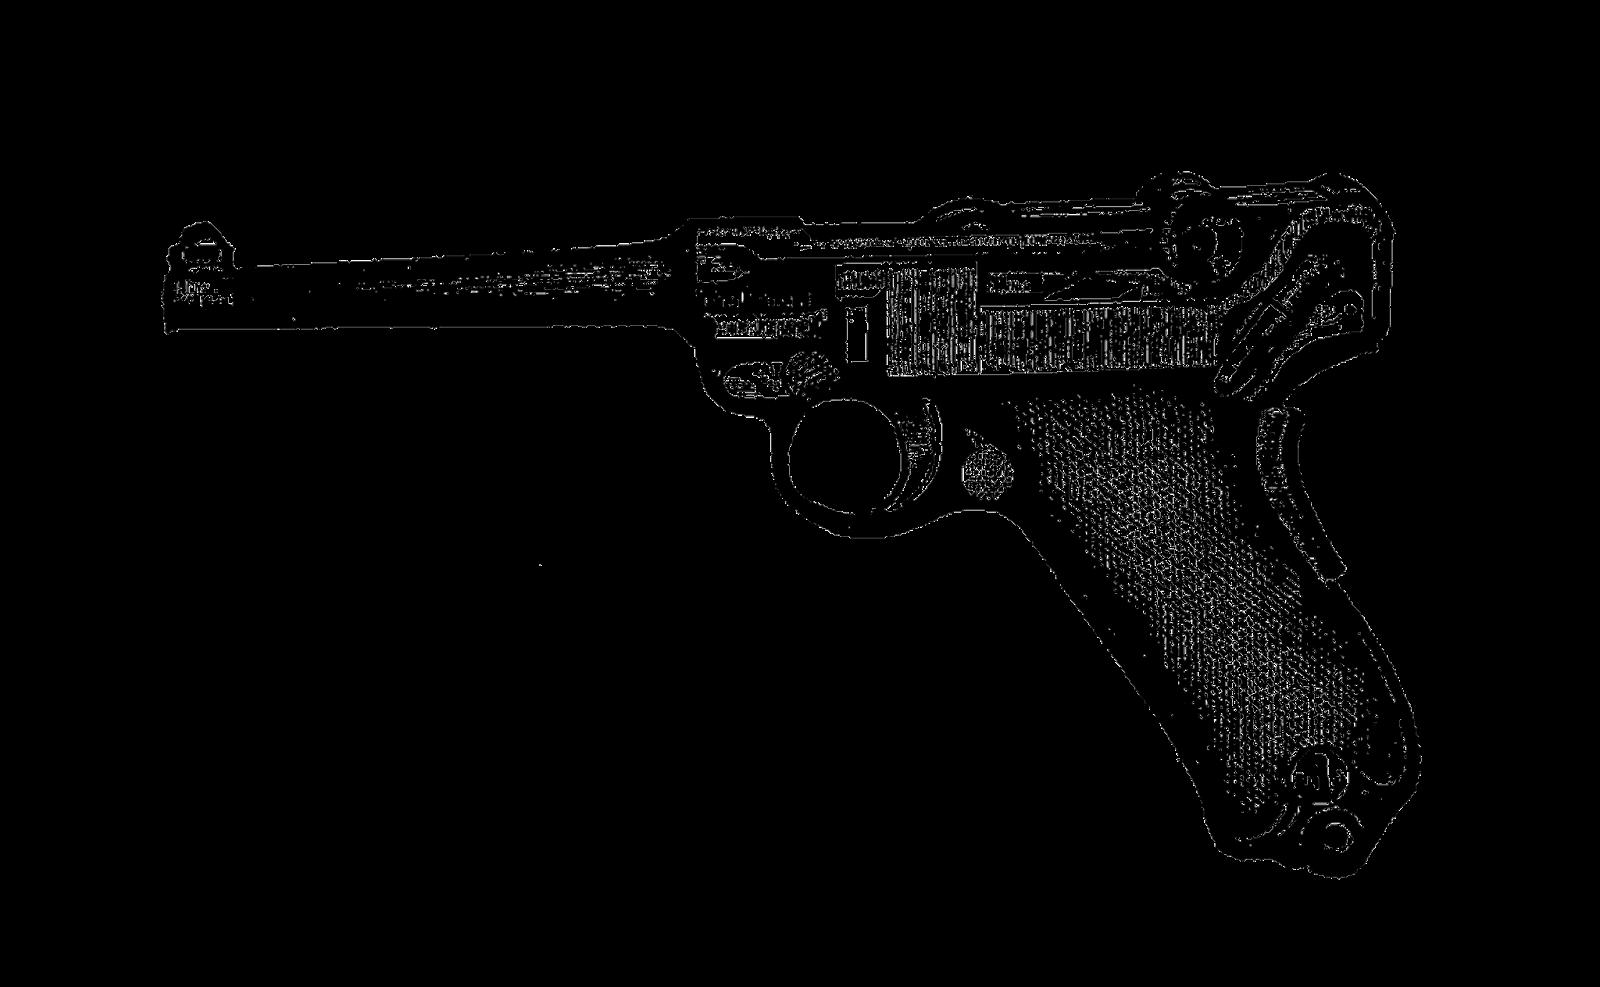 Clipart gun printable. Digital stamp design vintage